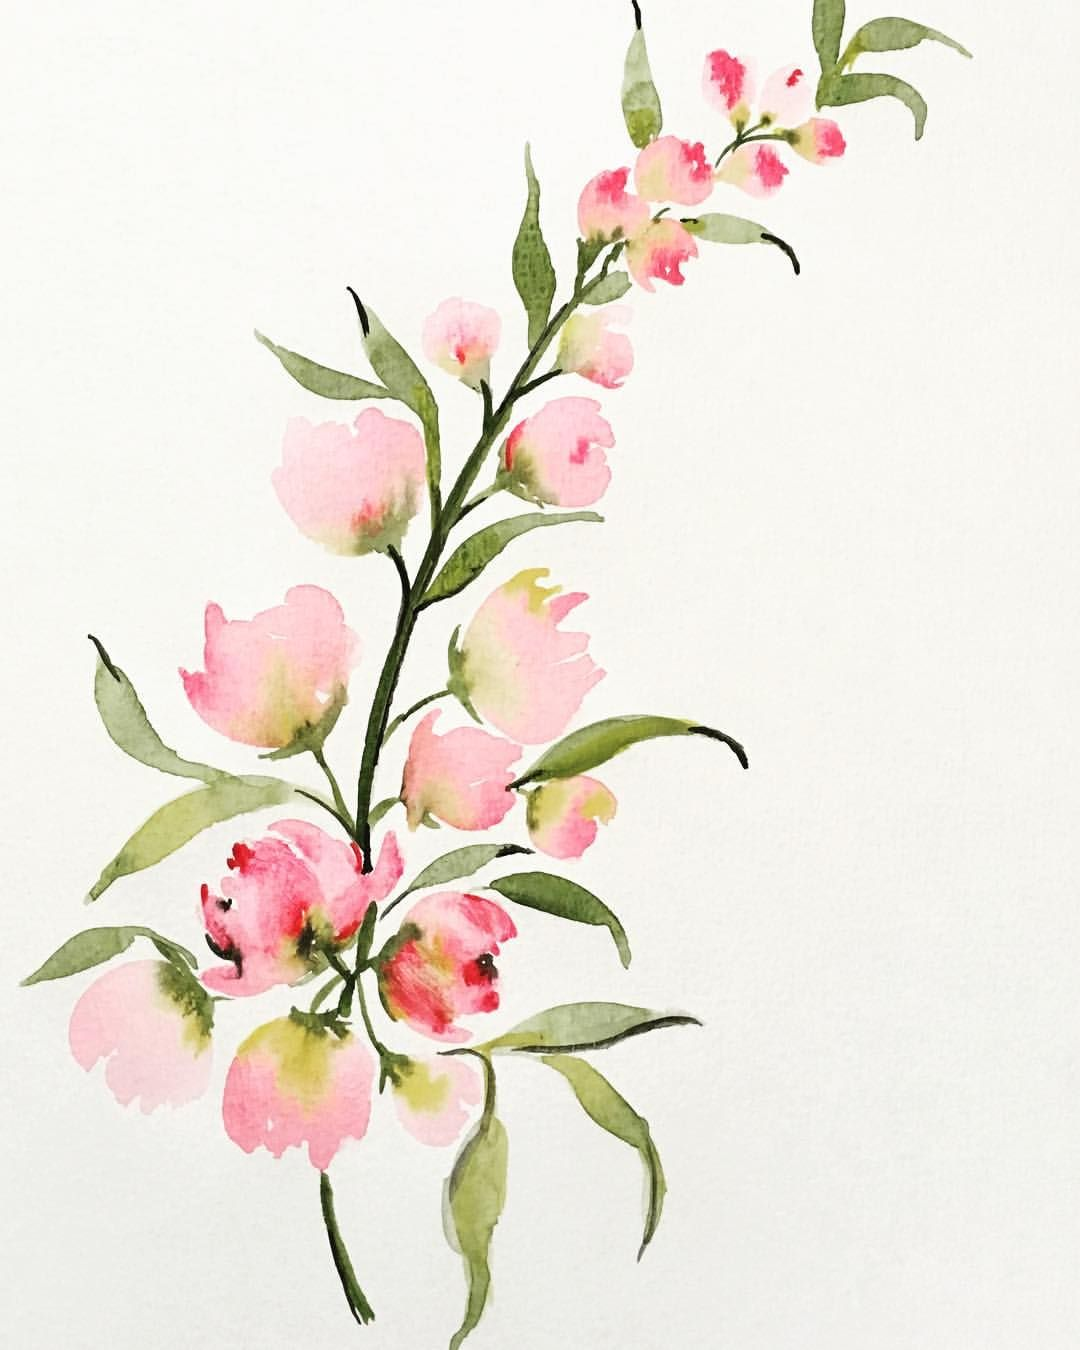 #flowerstagram #flowerartgraphy #flowers #flower #flower_daily #flowersofinstagram #flowerart ##flower_beauties_ #flowermagic #florals…